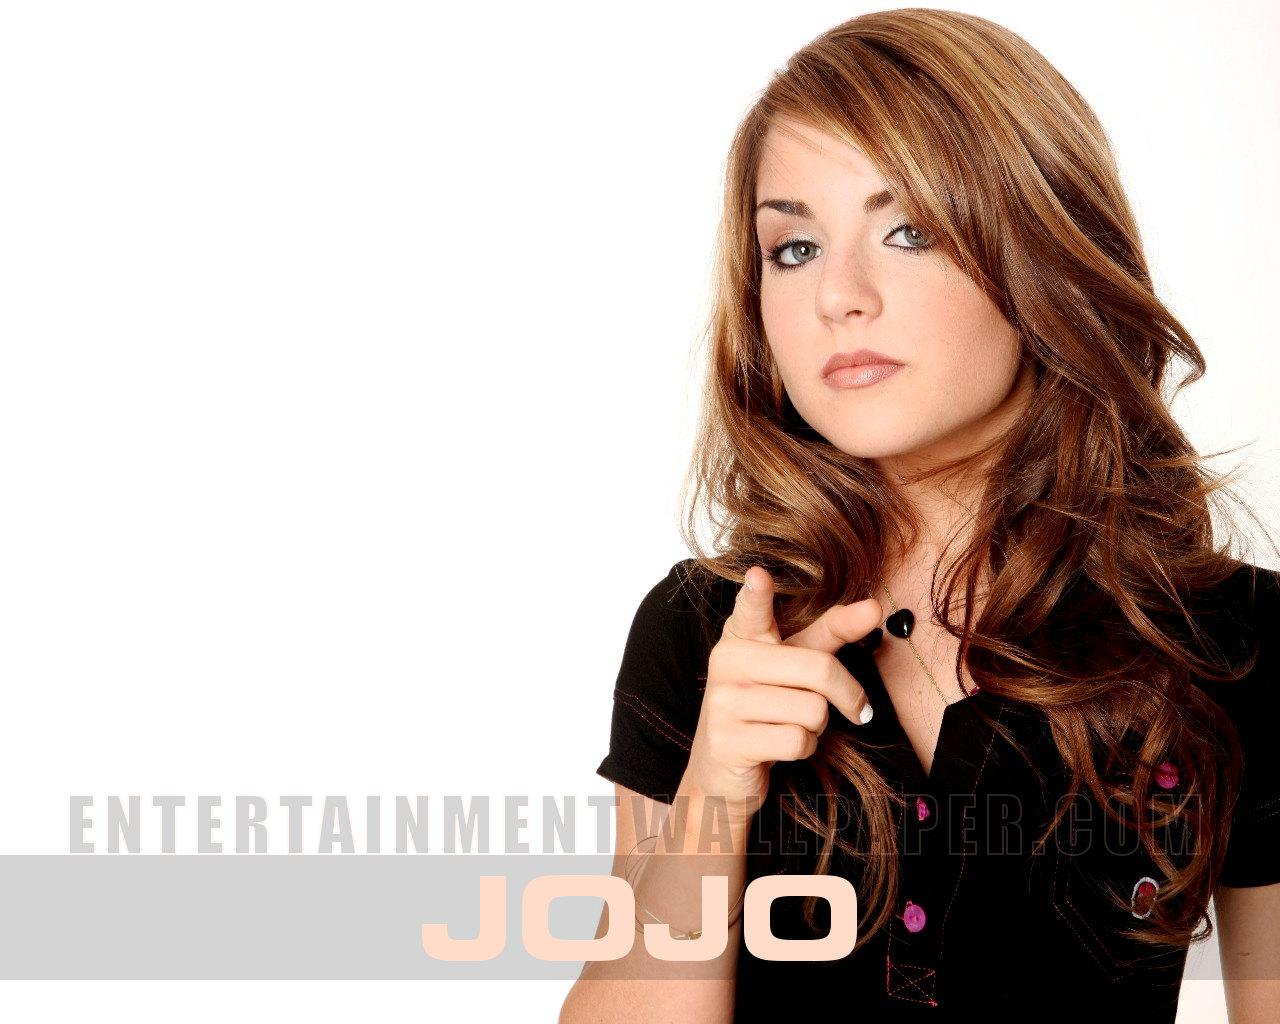 JoJo Wallpaper